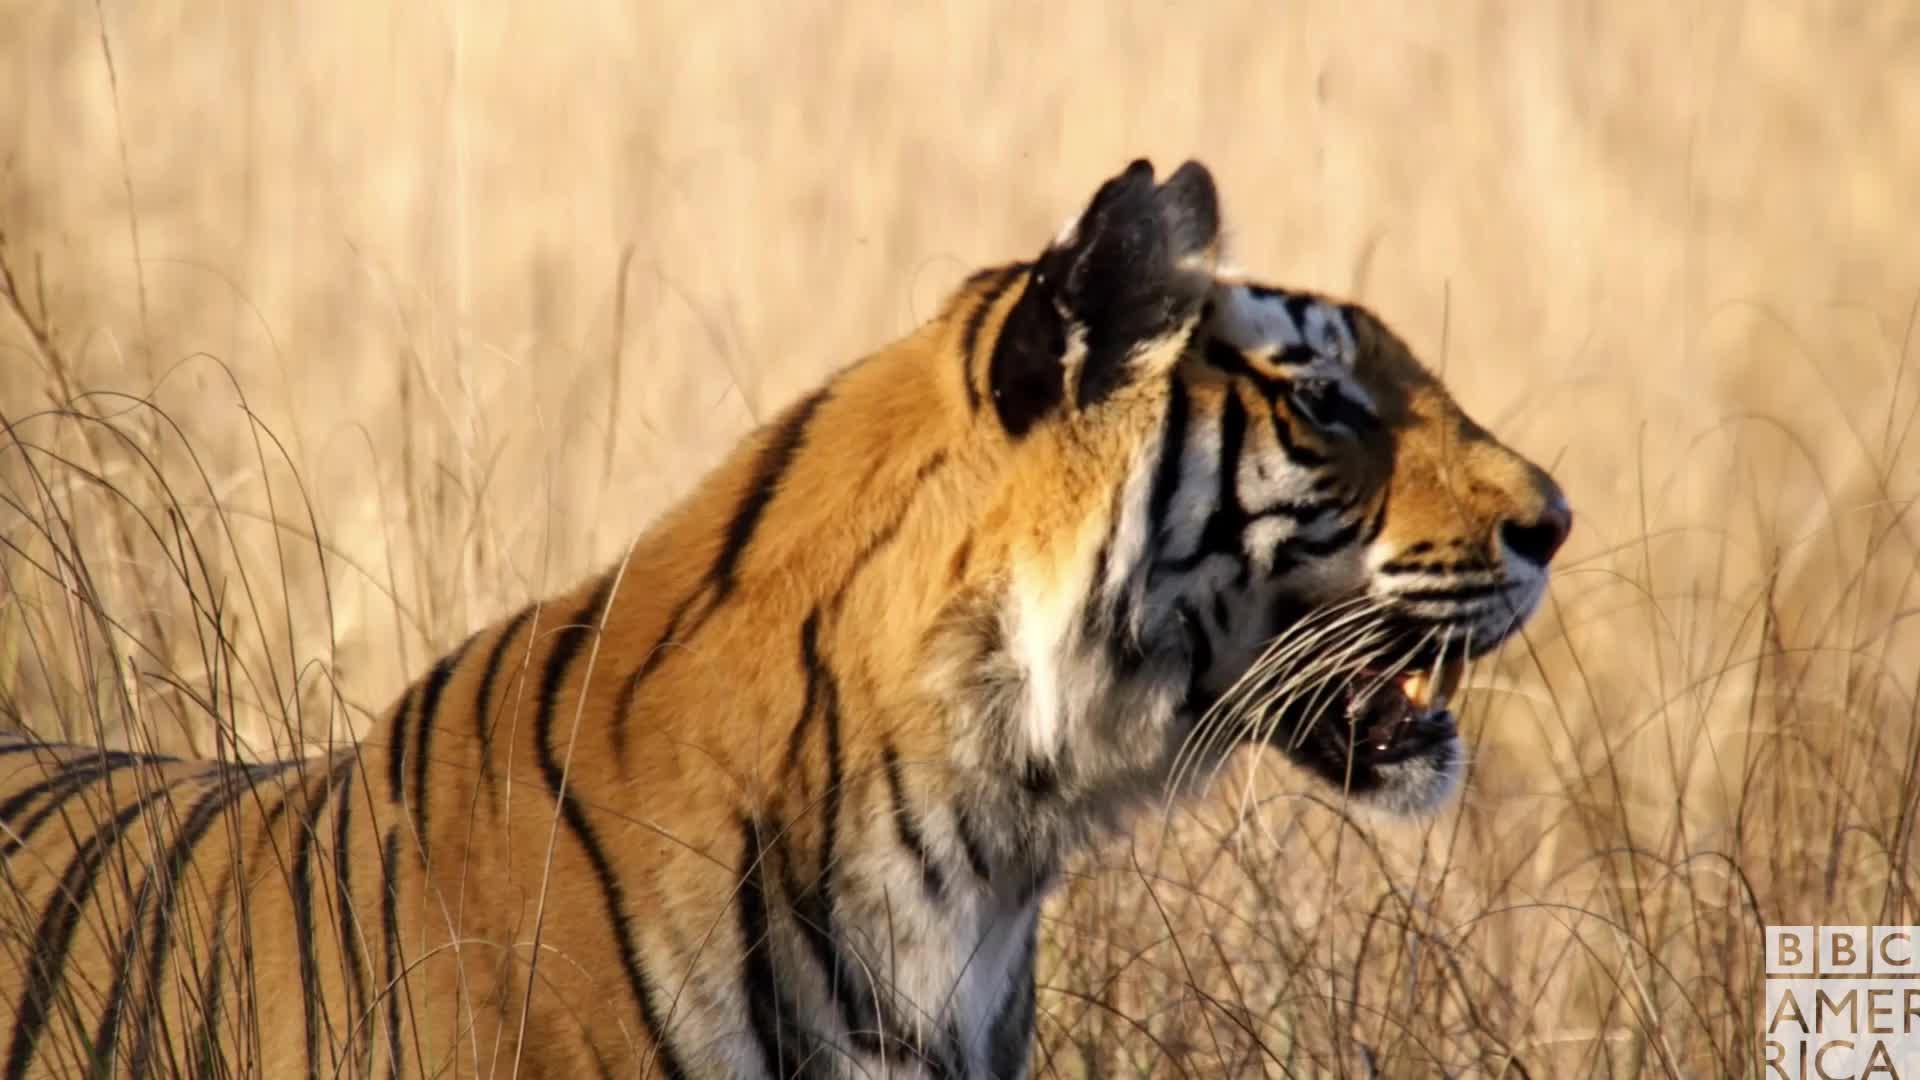 animal, animals, bbc america, bbc america dynasties, bbc america: dynasties, dynasties, hmm, thinking, tiger, tigers, umm, what, Dynasties Tiger What GIFs